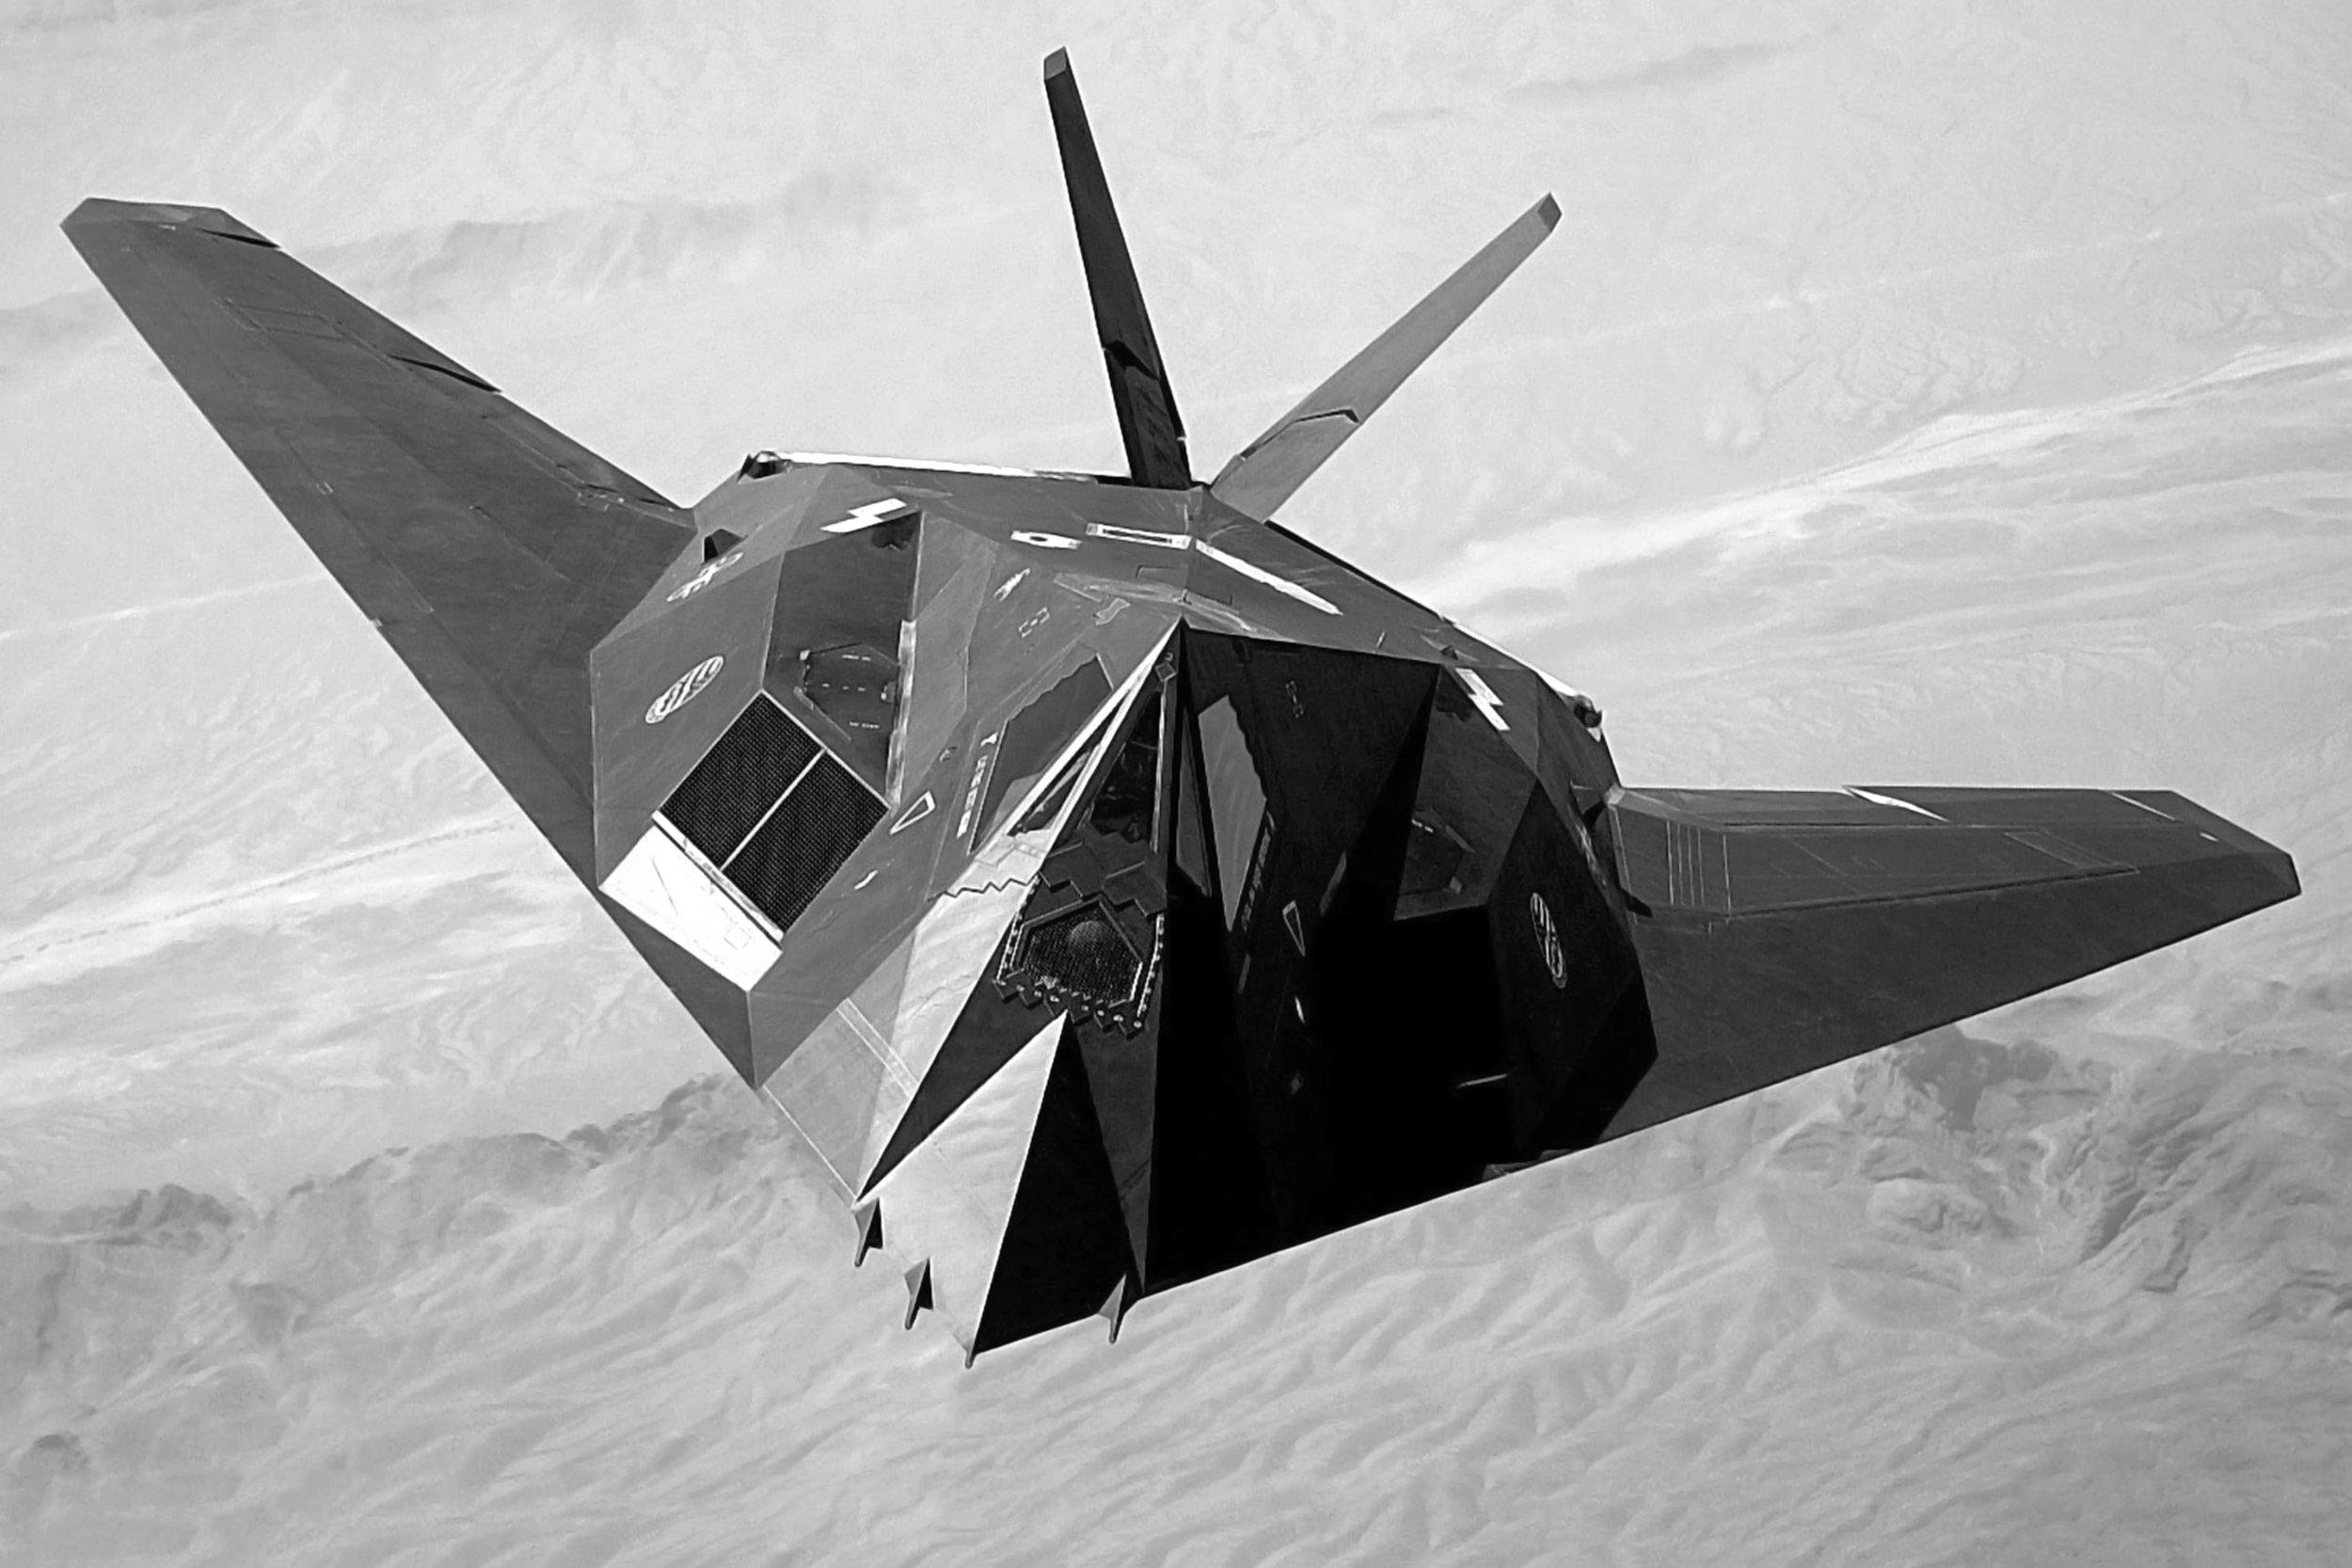 F-117_Nighthawk_Front-blackandwhite.jpg